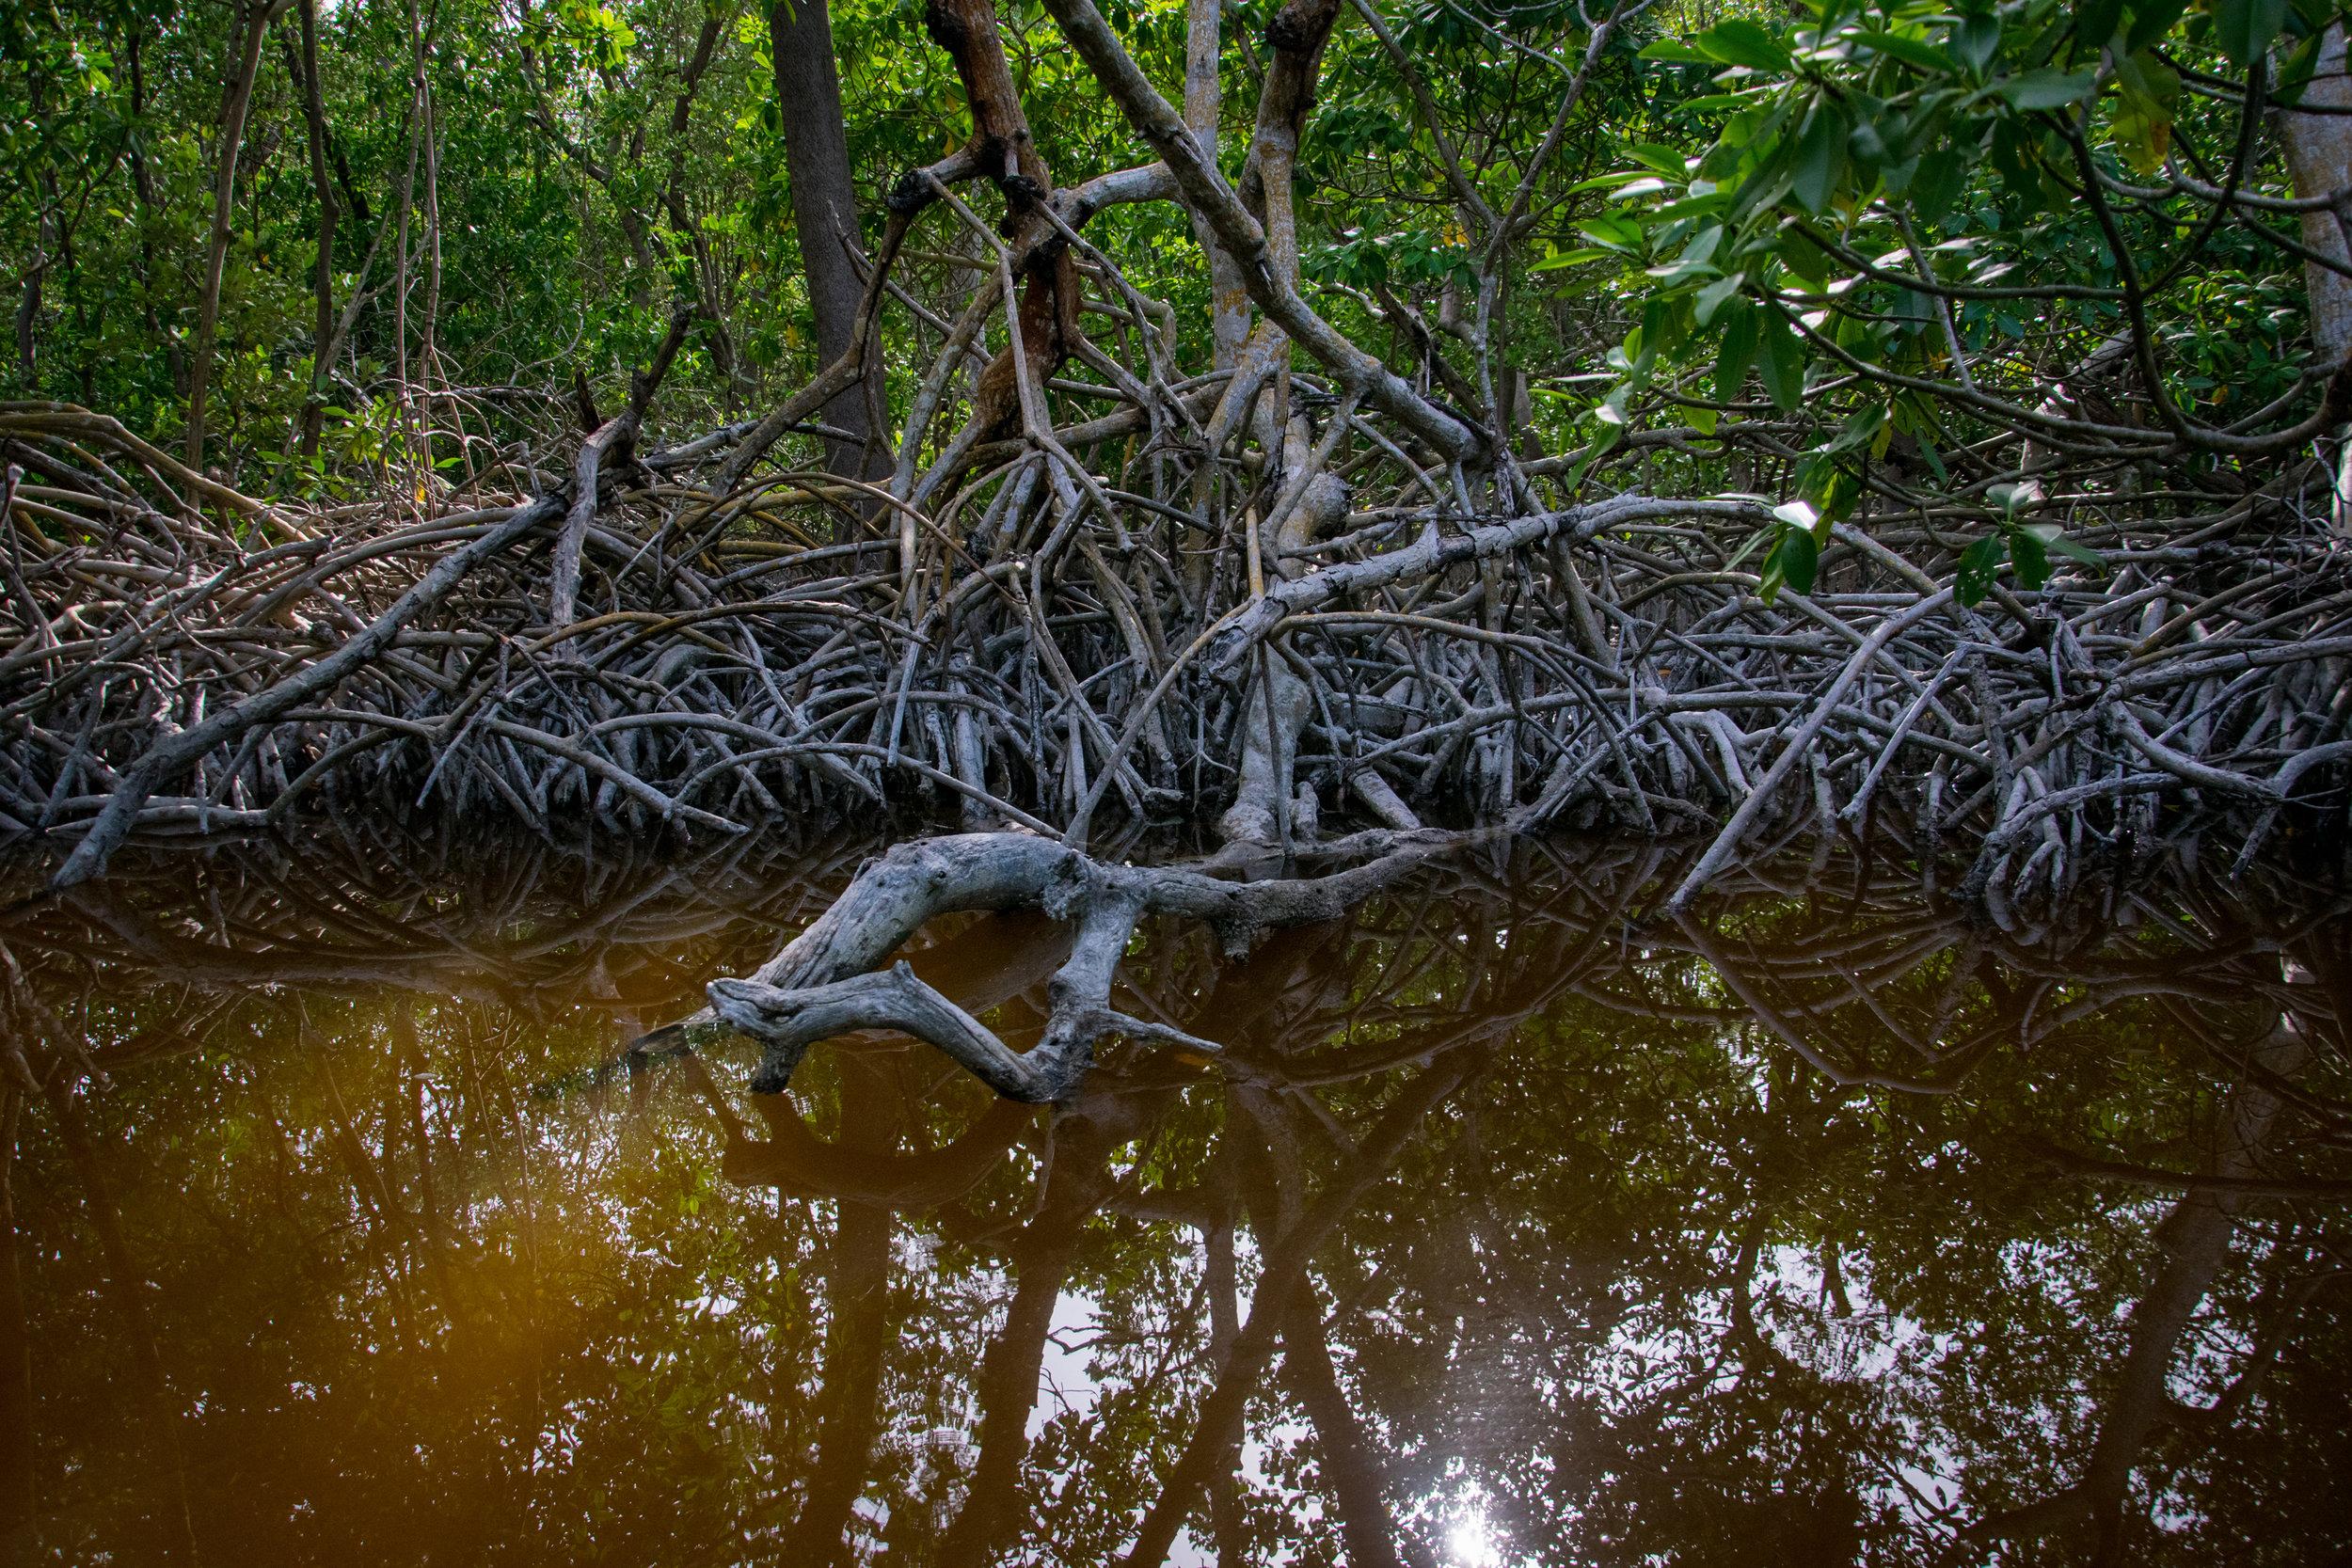 The Mangroves of Dizinitun